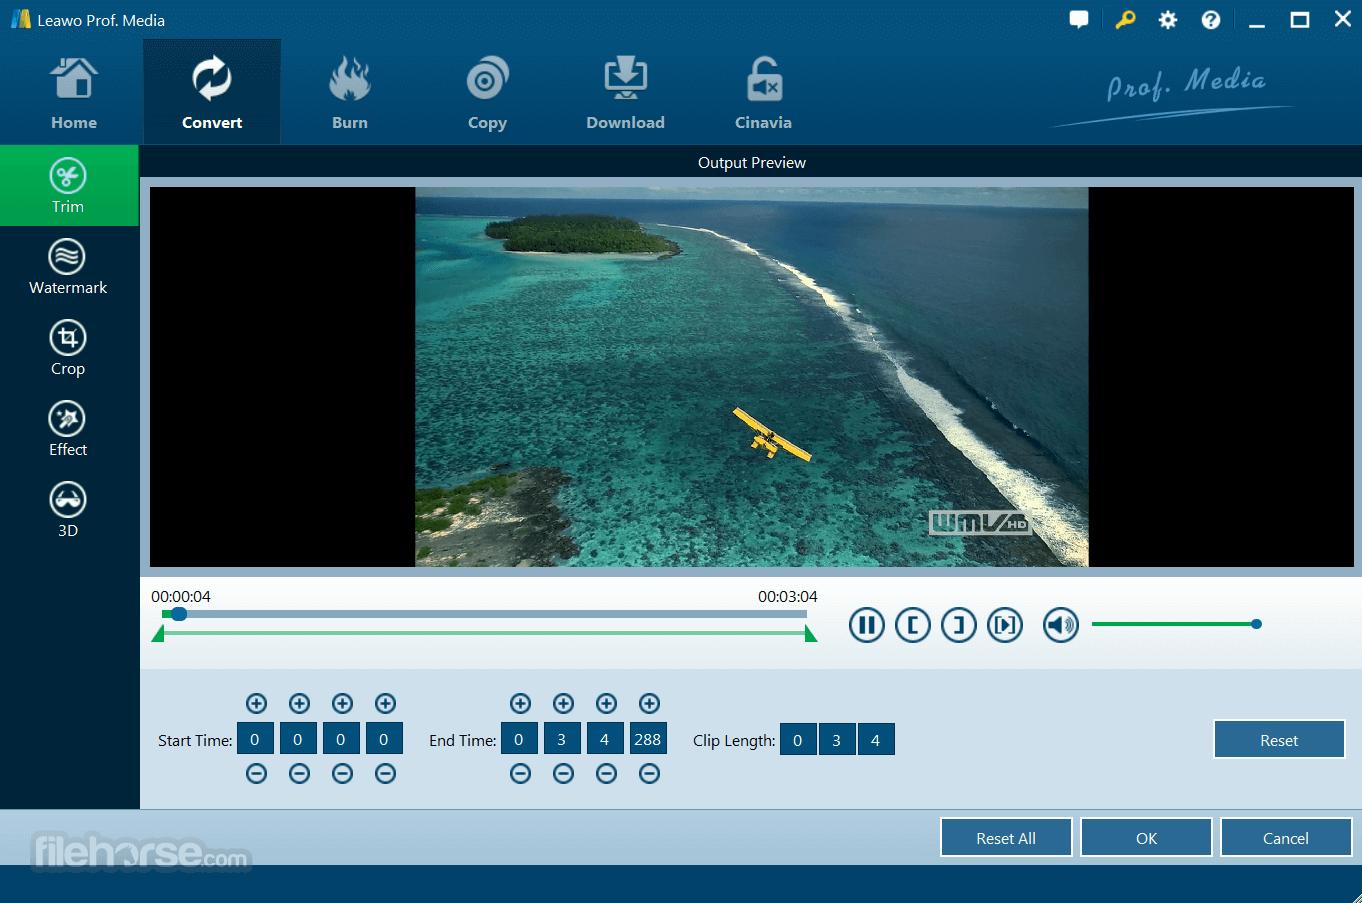 Leawo Blu-ray Ripper 8.3.0.0 Screenshot 4